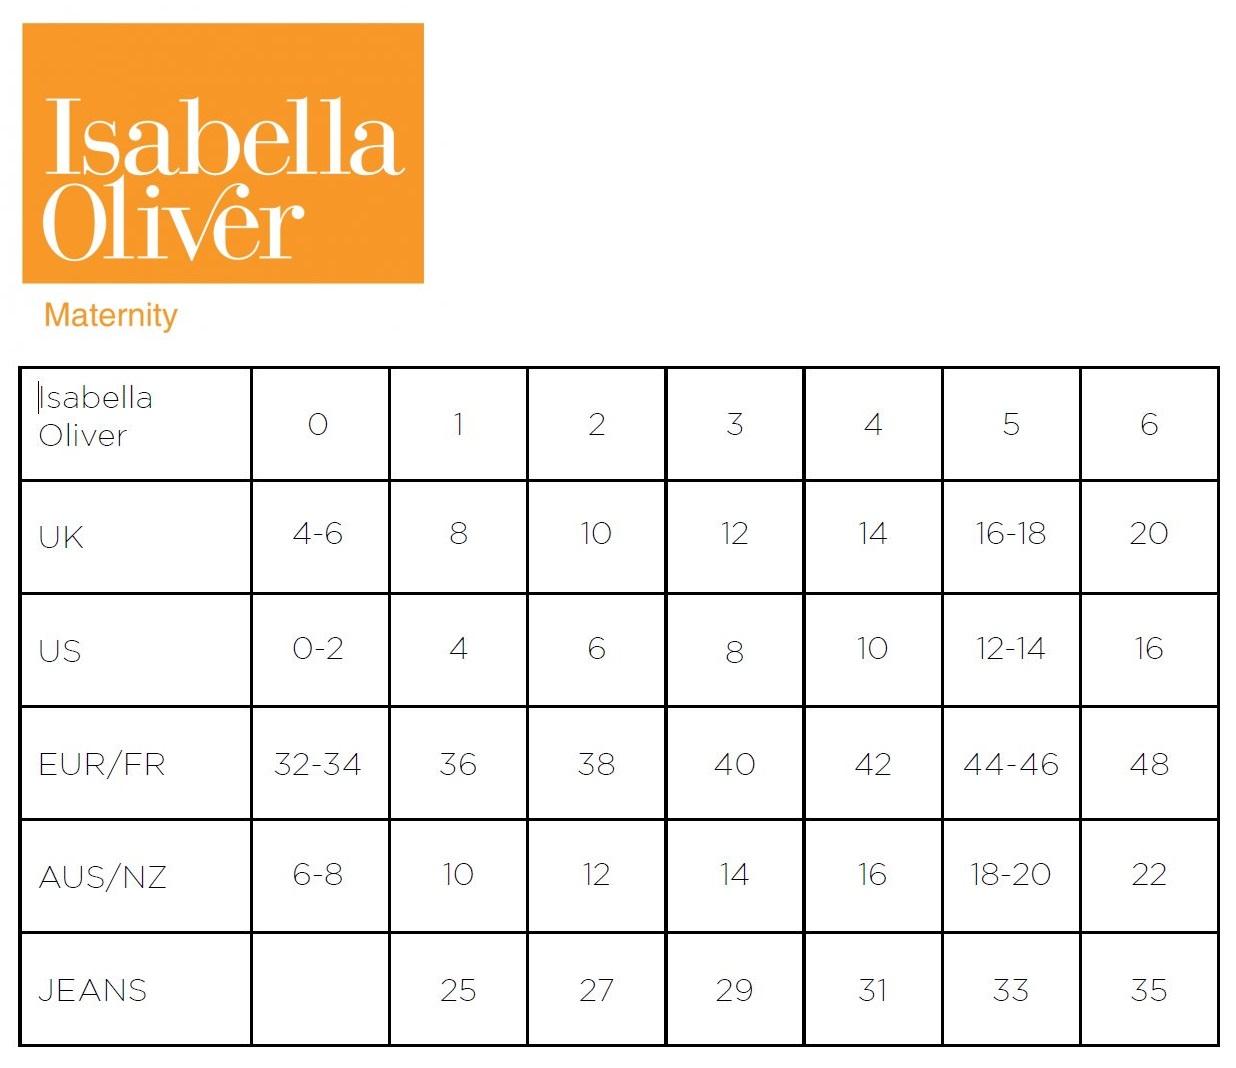 Isabella oliverg seraphine size guideg also maternity chart motherhood closet consignment rh motherhoodcloset